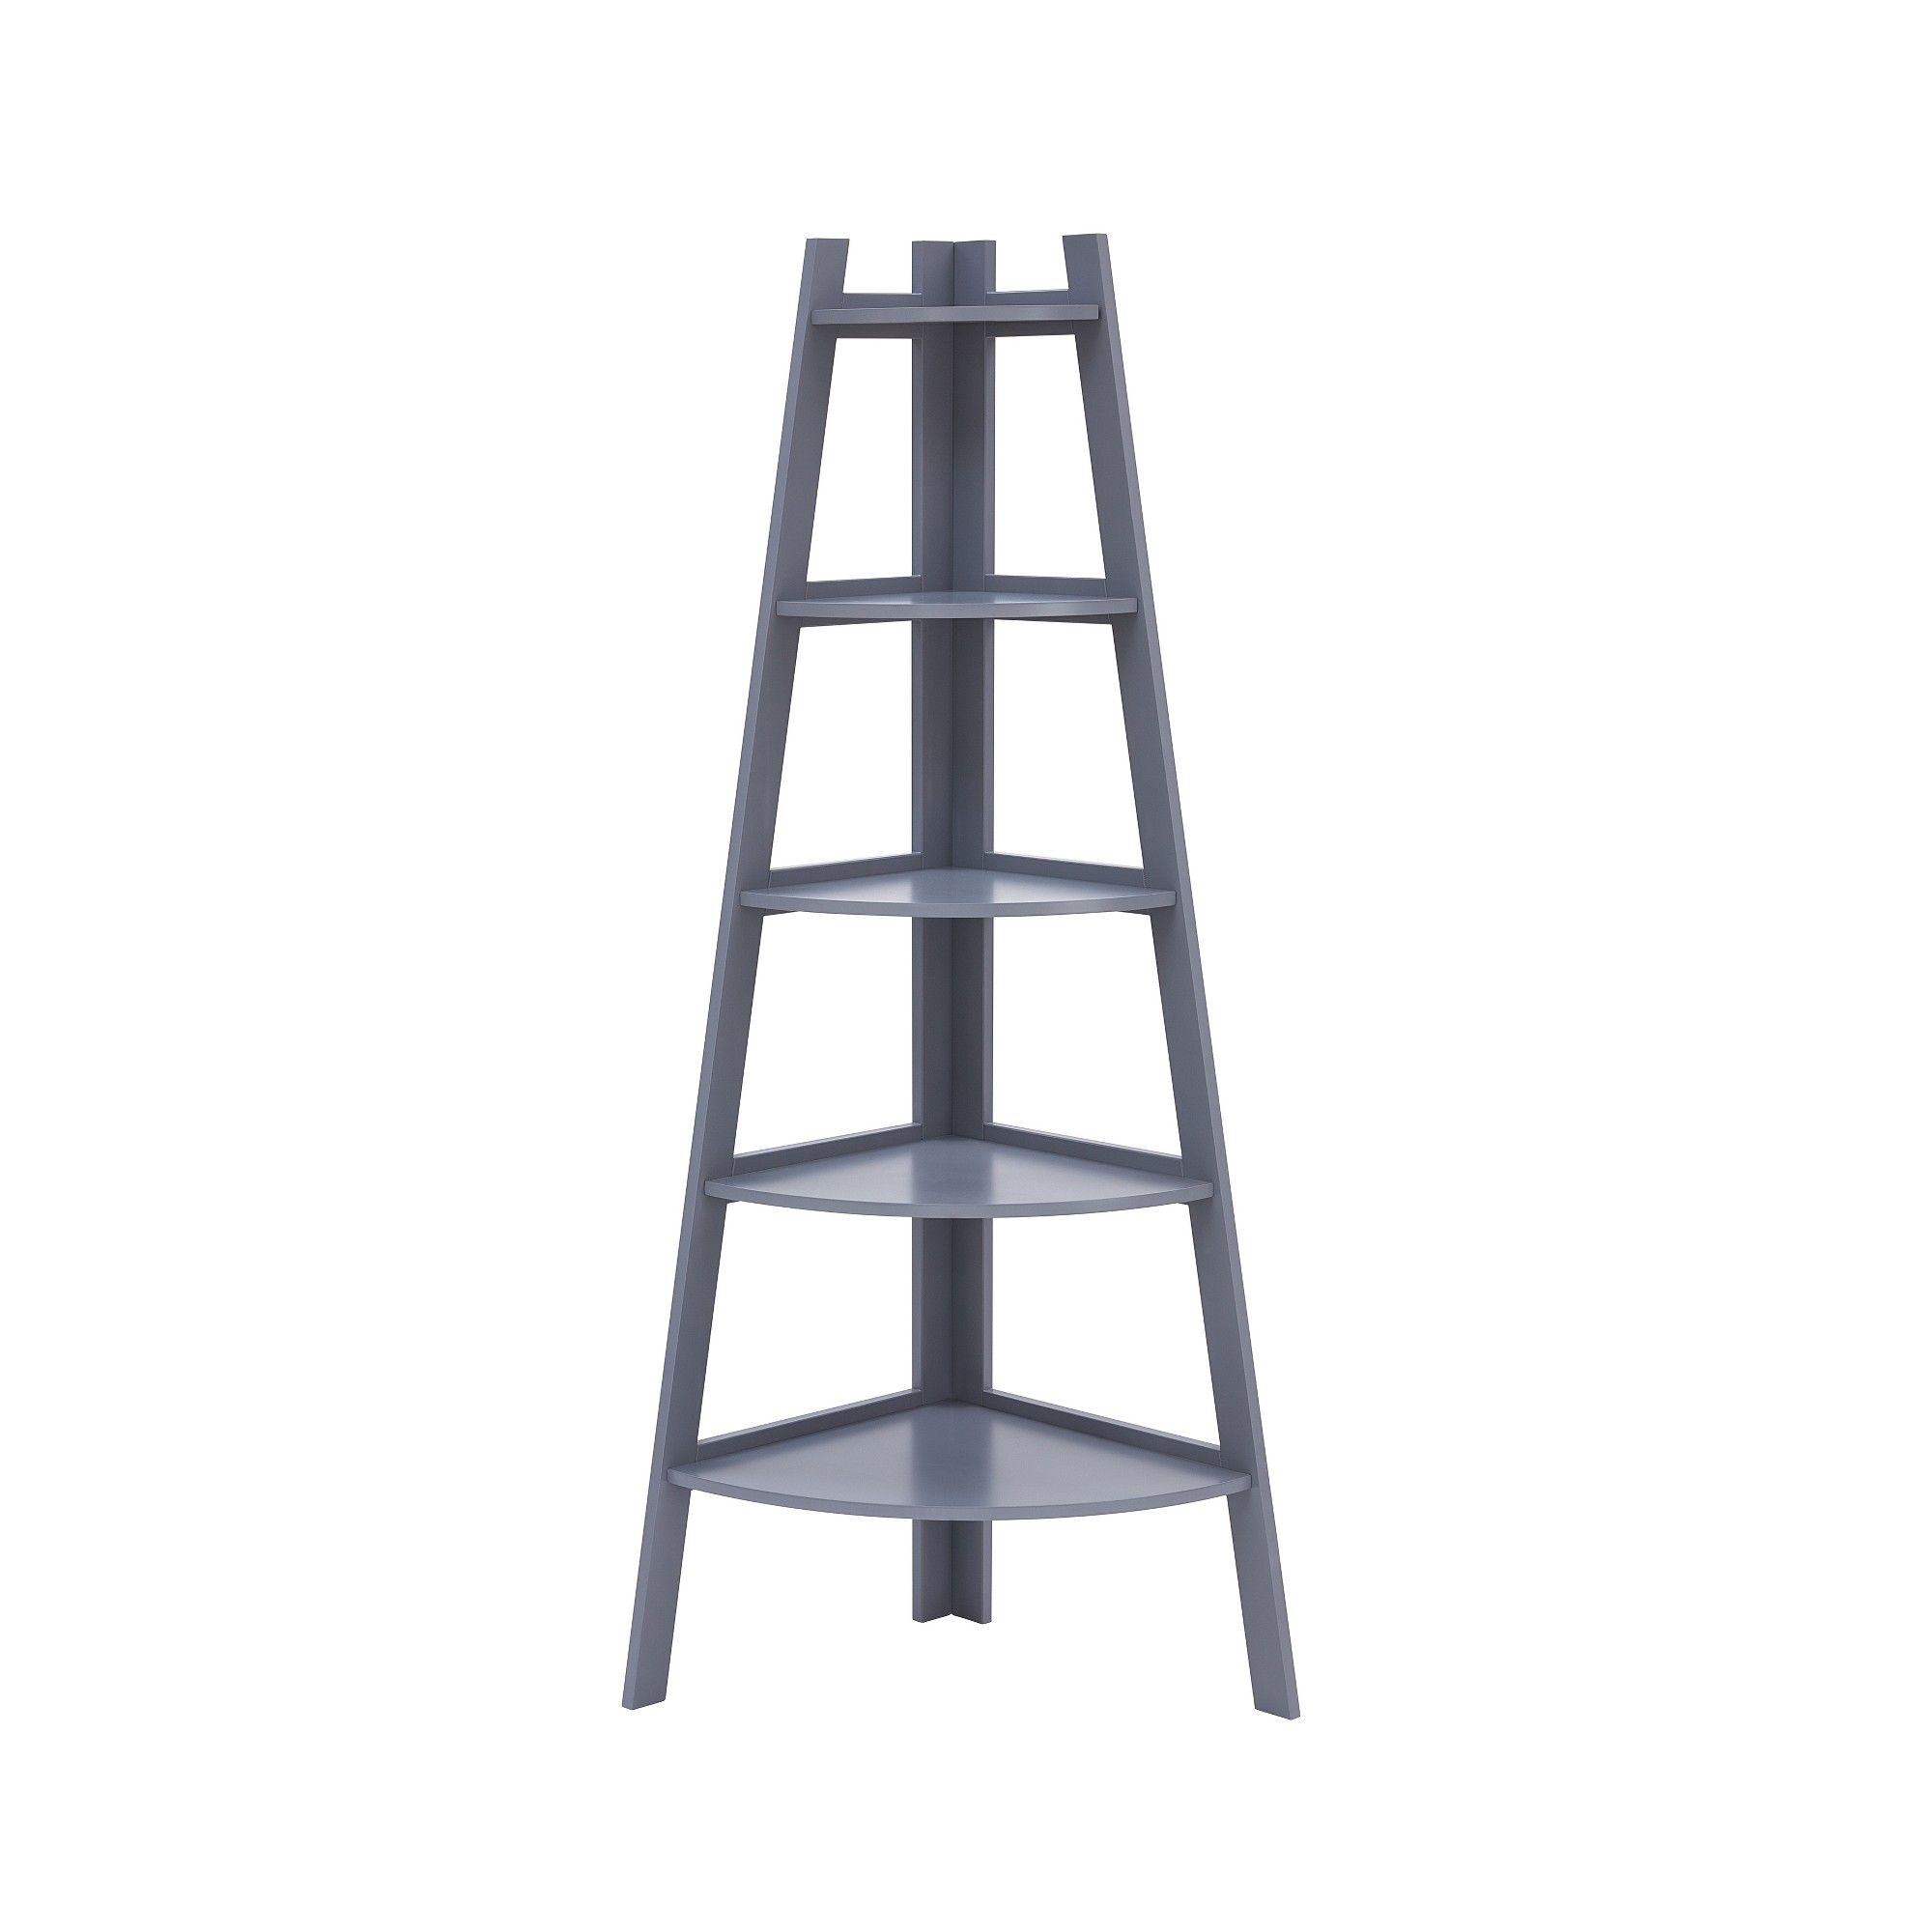 Danya b decorative tier a frame corner ladder display bookcase